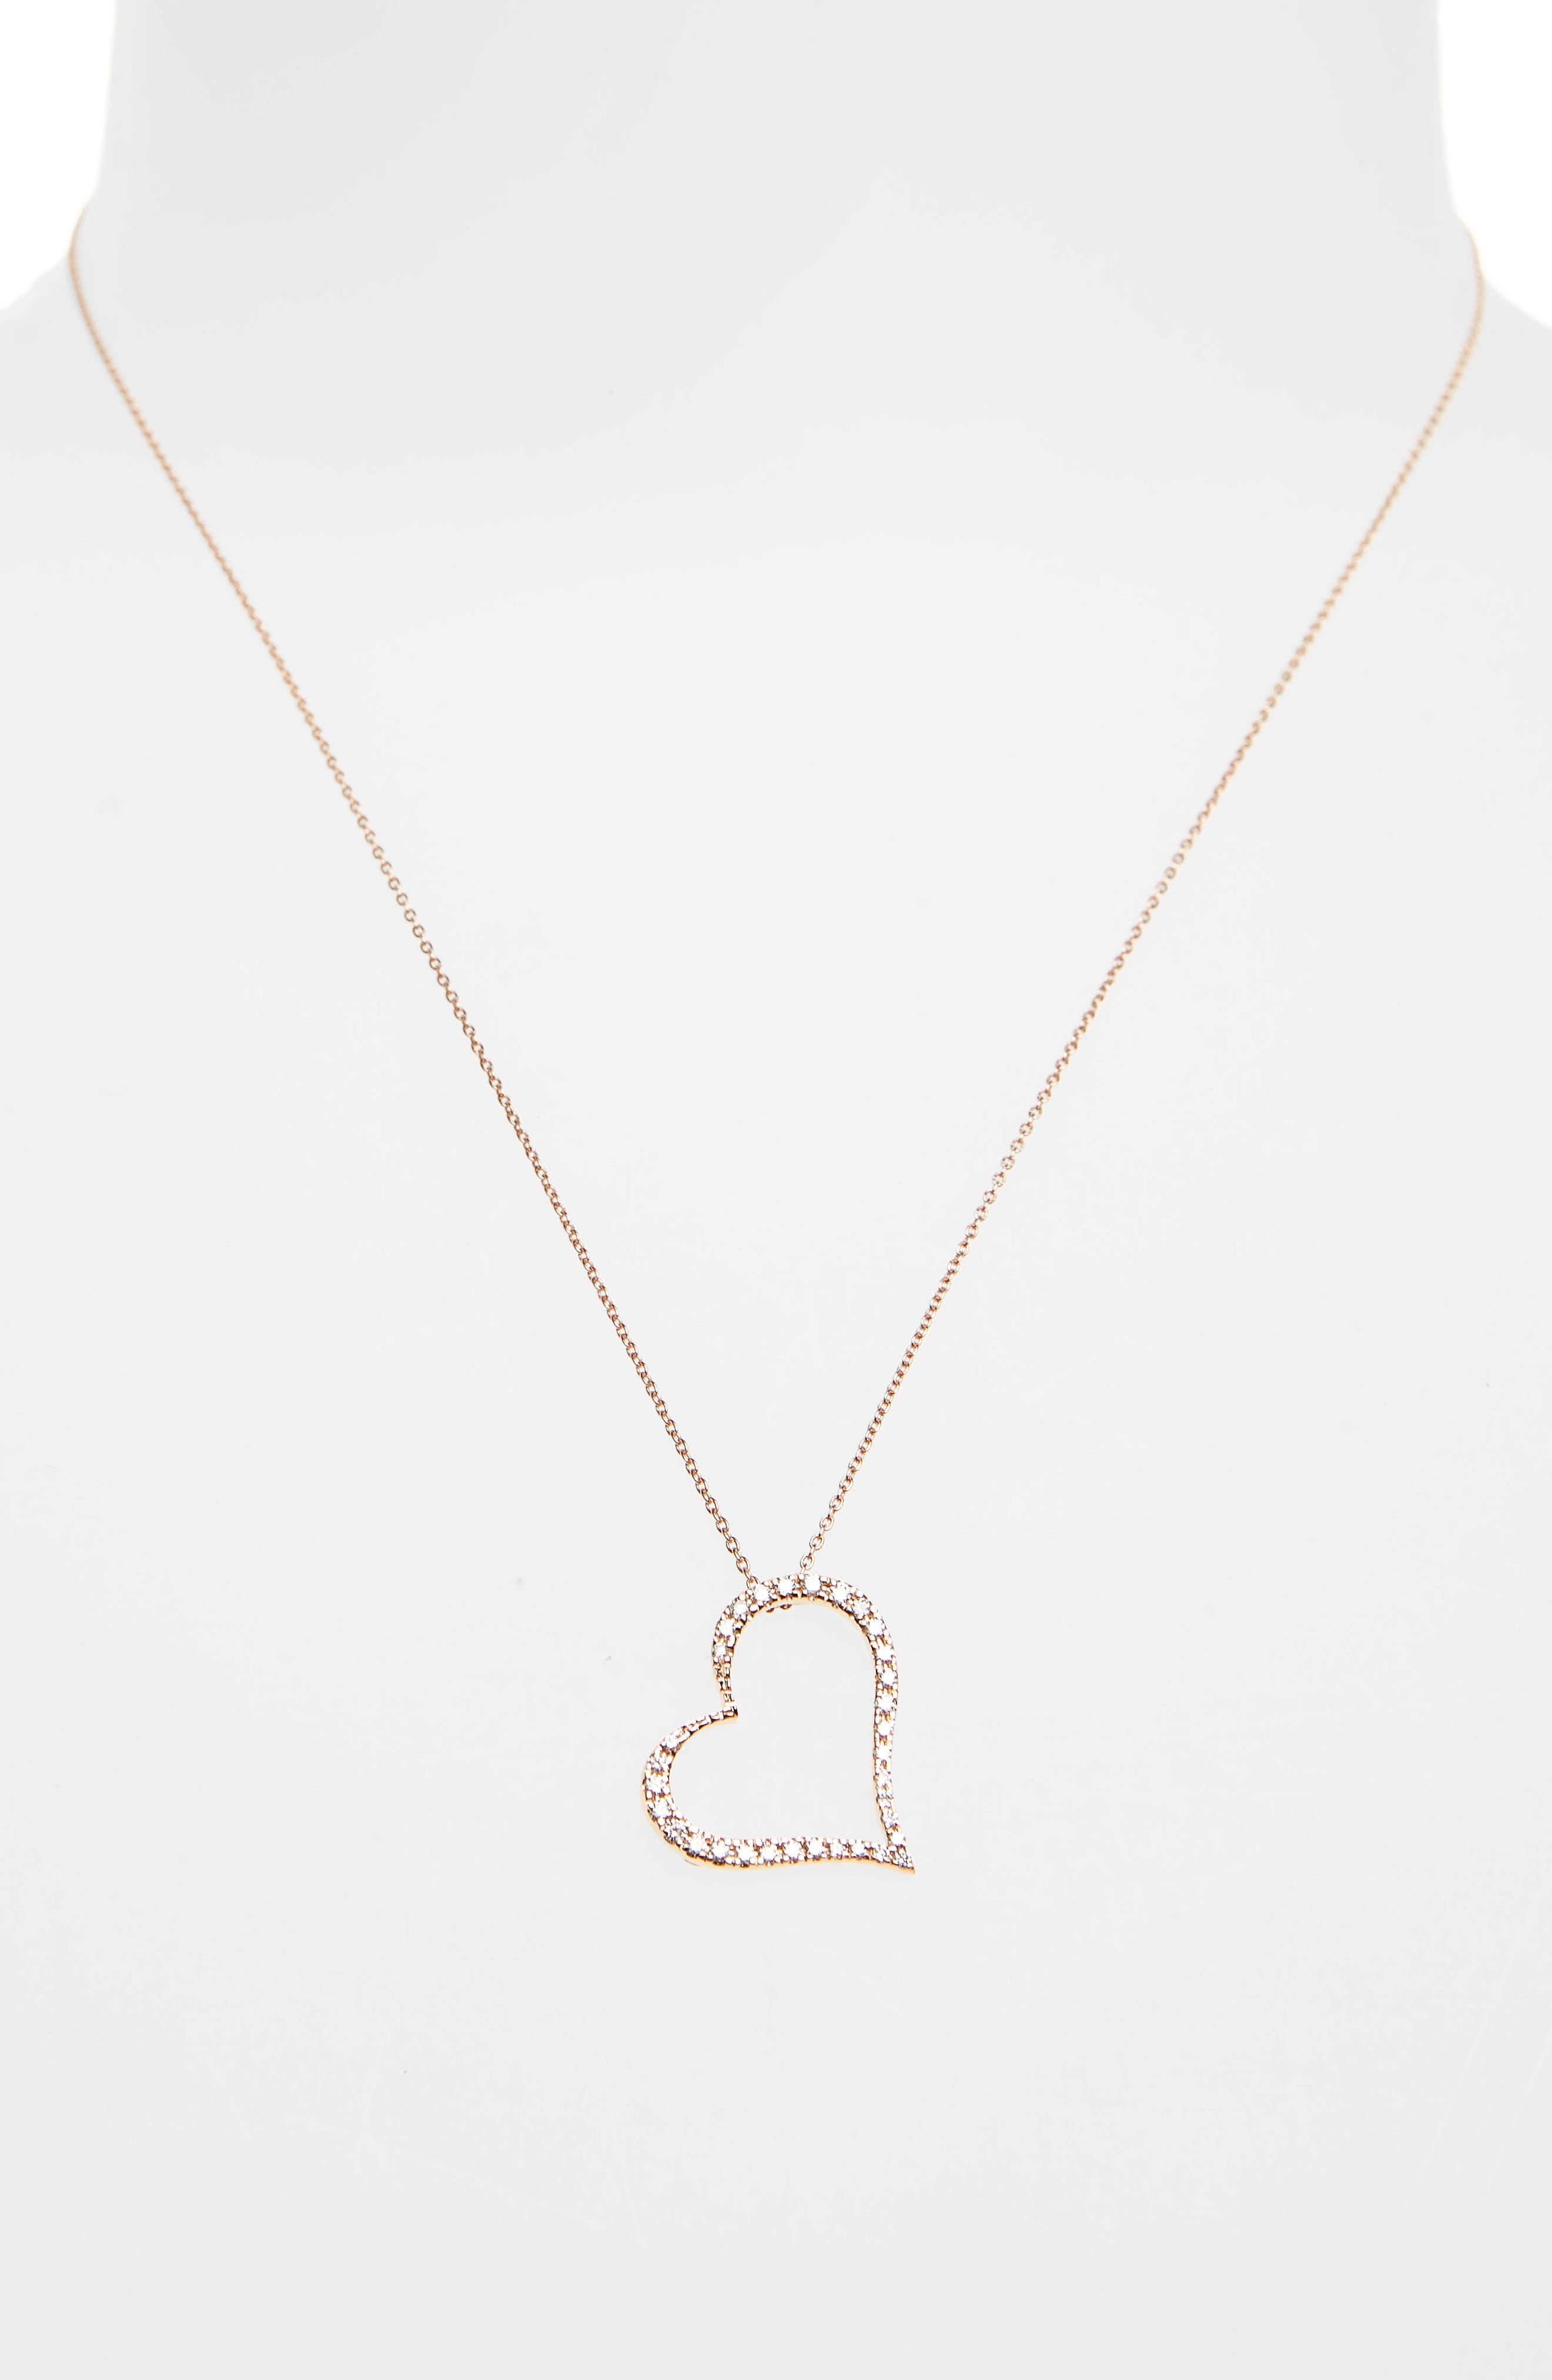 Diamond Slant Heart Pendant Necklace,                             Alternate thumbnail 2, color,                             Rose Gold